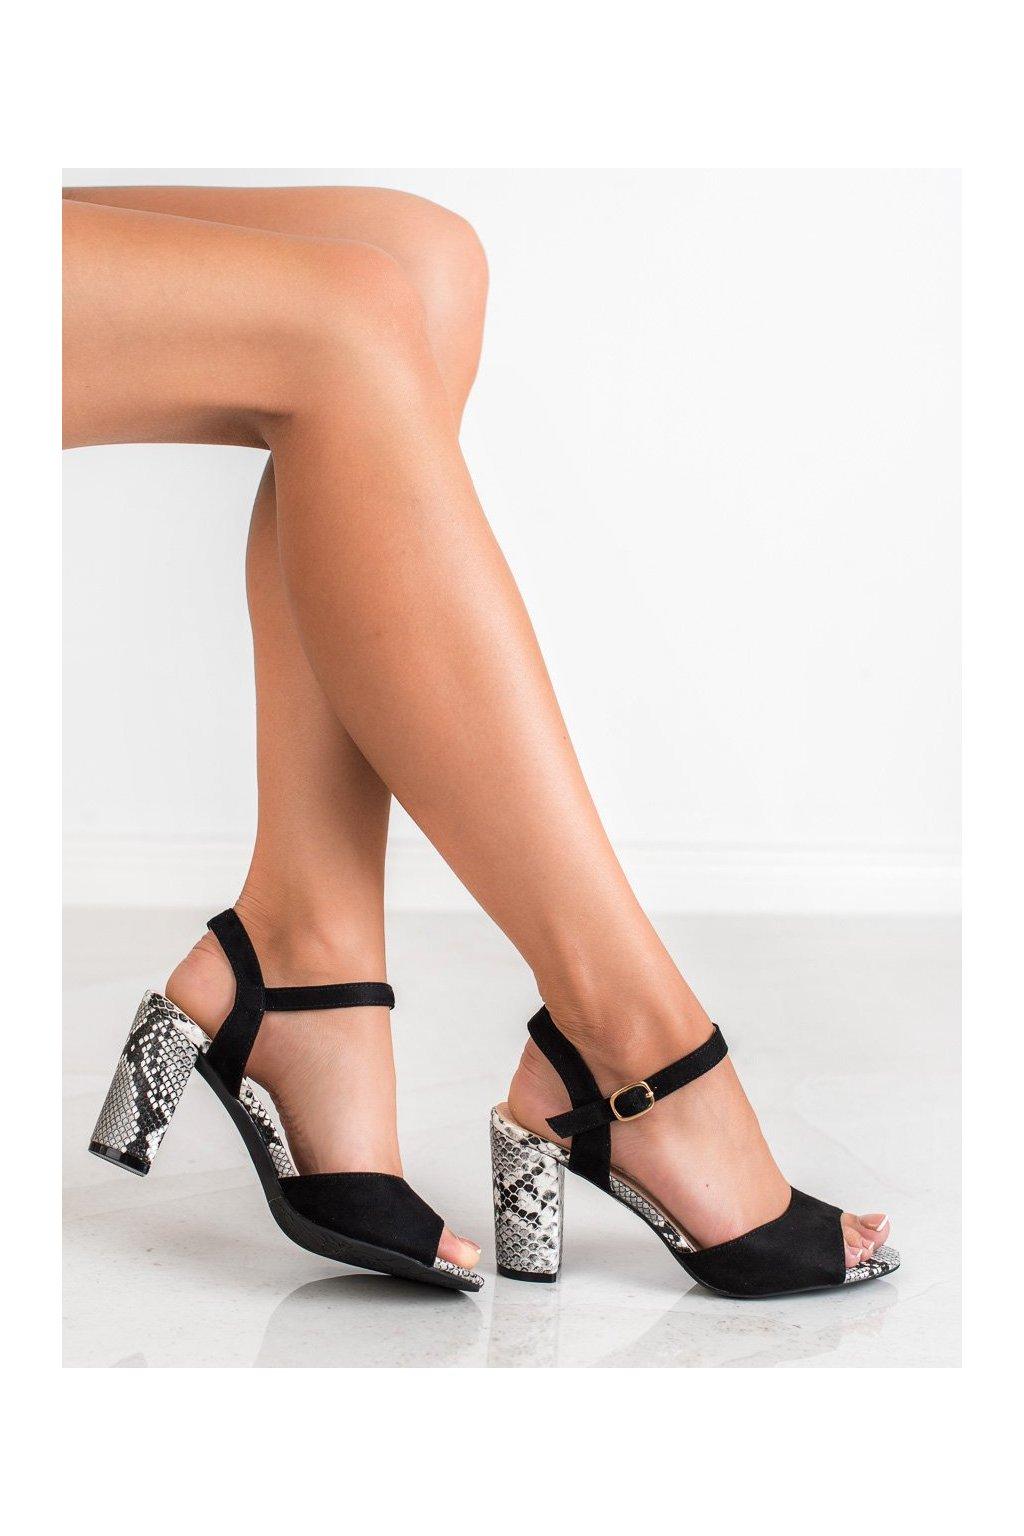 Čierne topánky Vinceza kod LE20-20102B